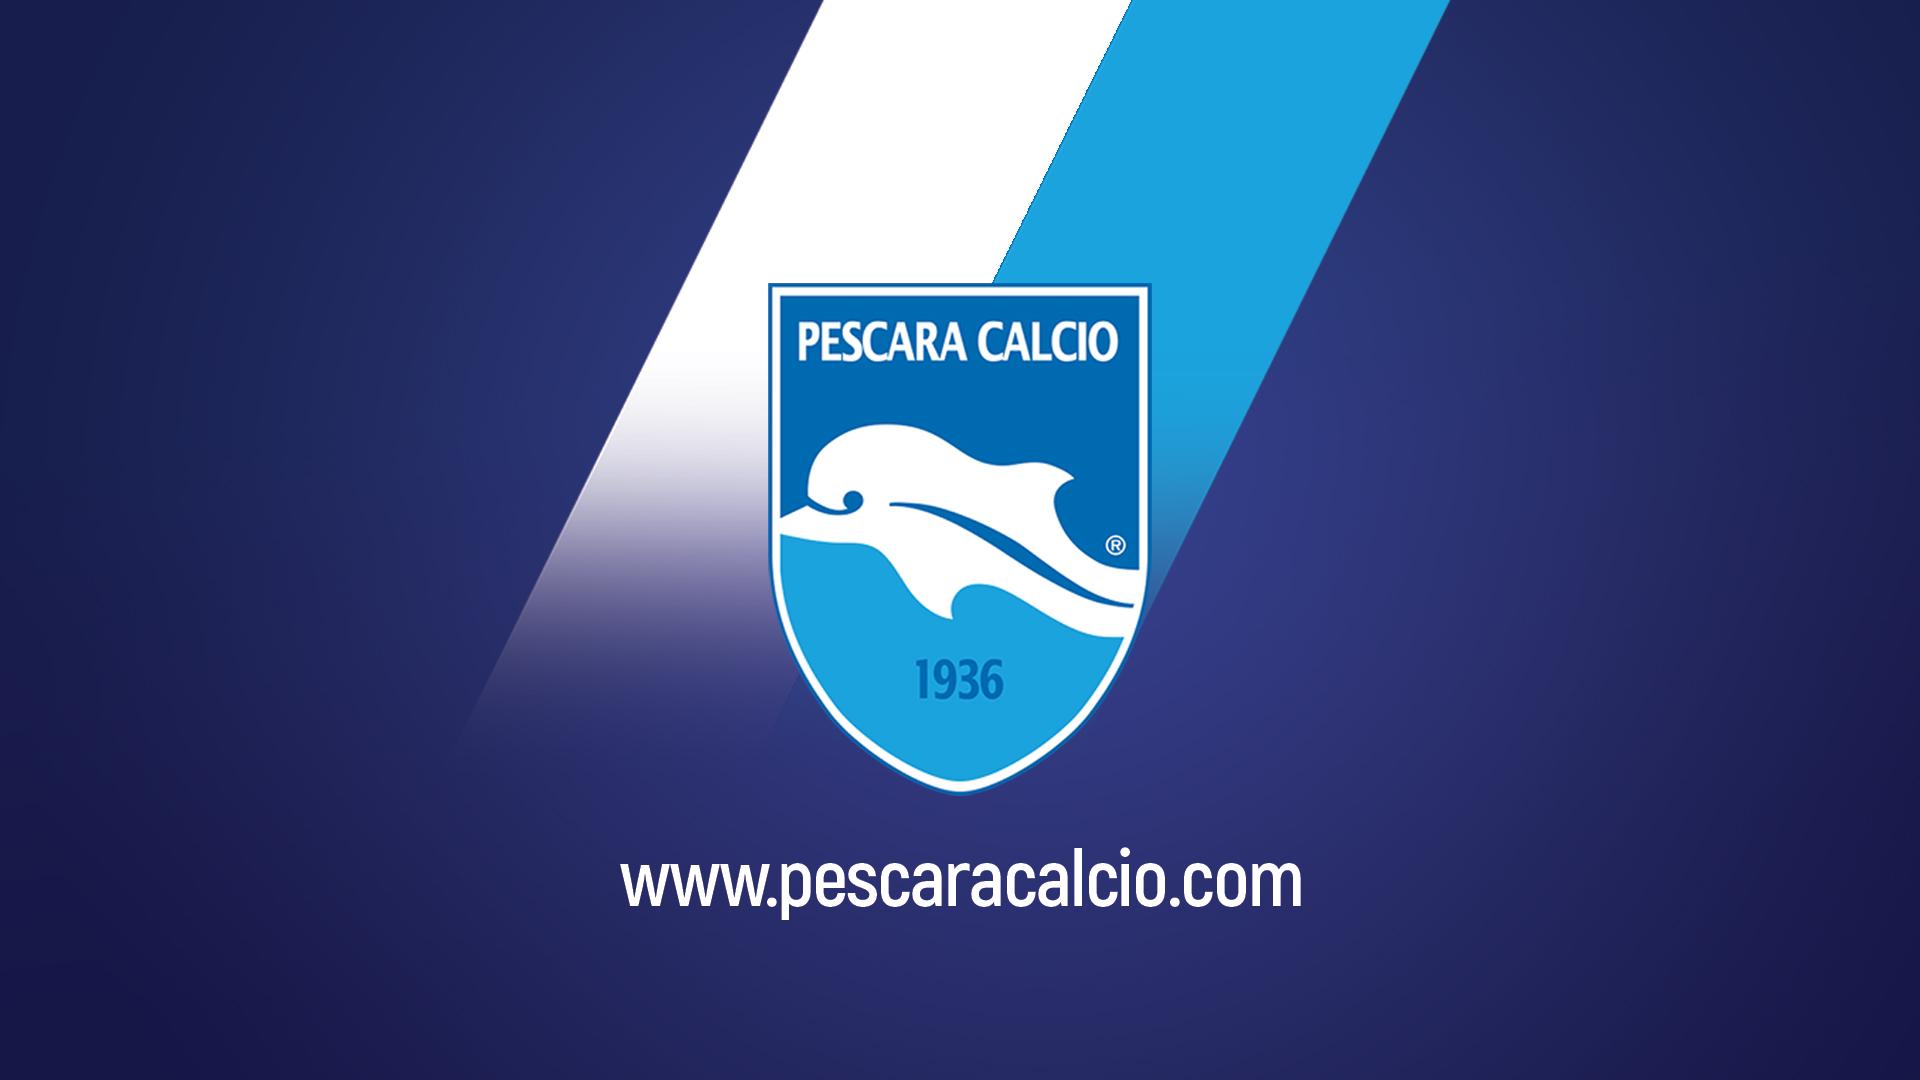 Pescara Camera Di Commercio : Seminario nuovo stadio di pescara live pescara calcio 1936